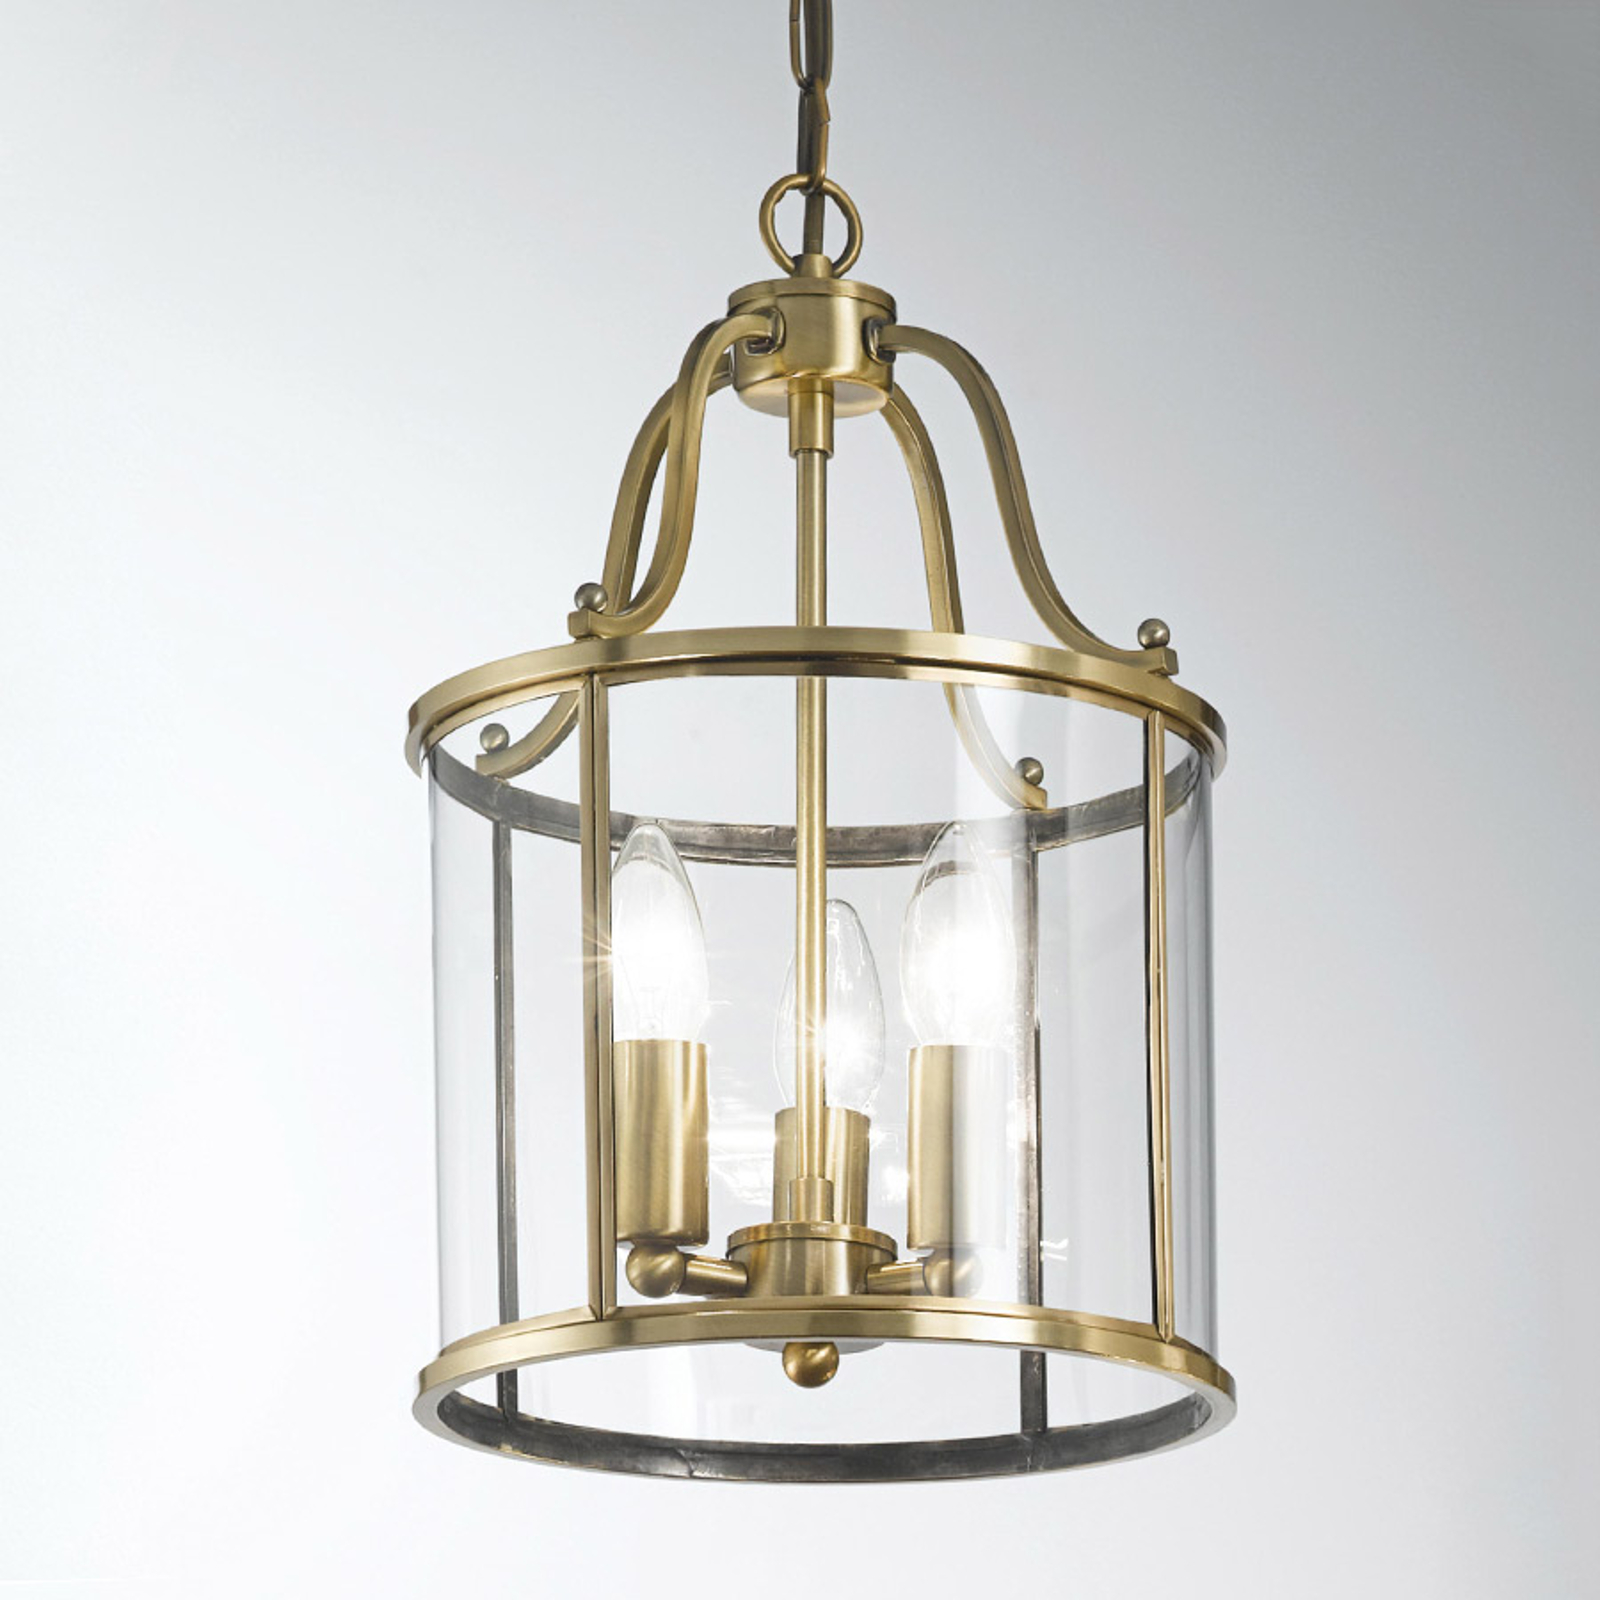 Rieka Hanging Light Lantern Shaped Round 25 Cm Lights Co Uk